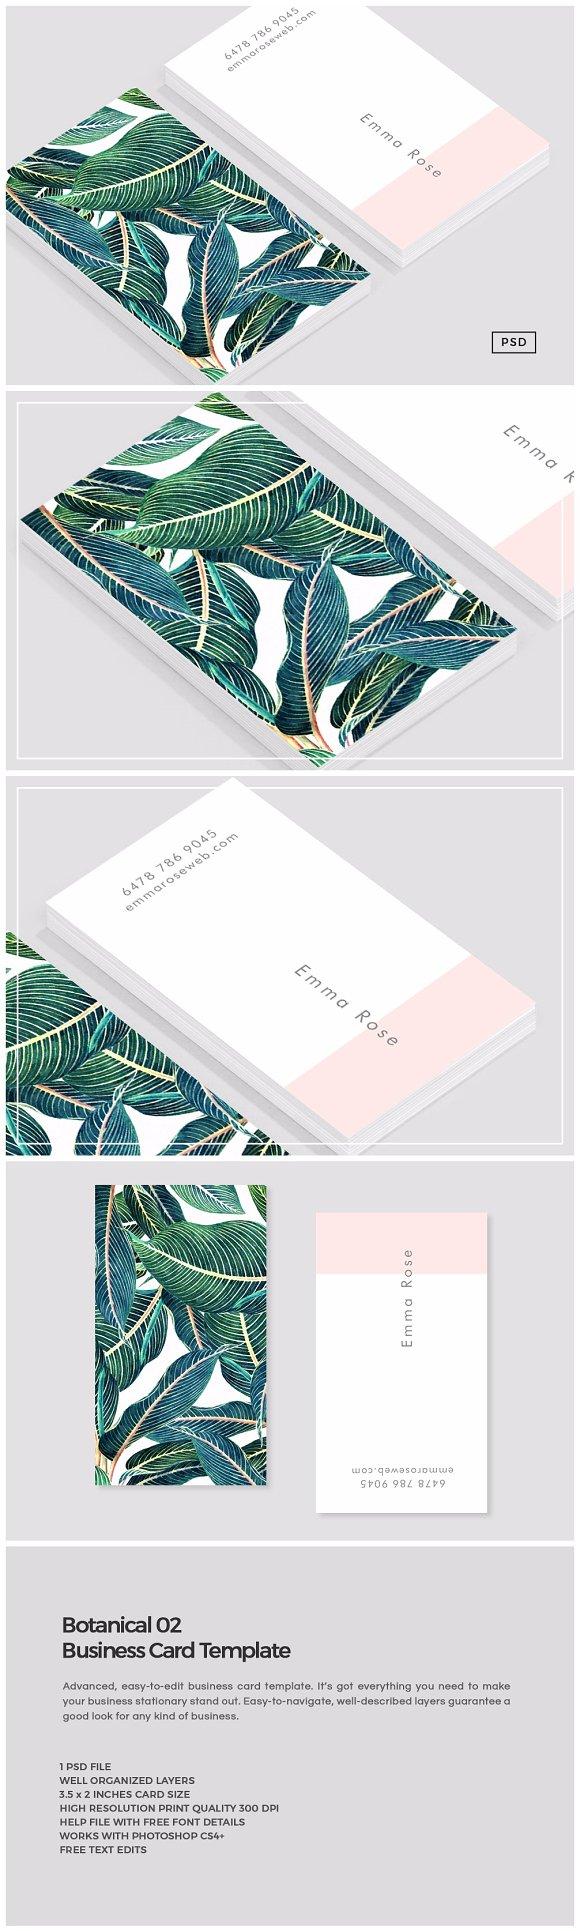 Botanical 02 Business Card Template ~ Business Card Templates ...